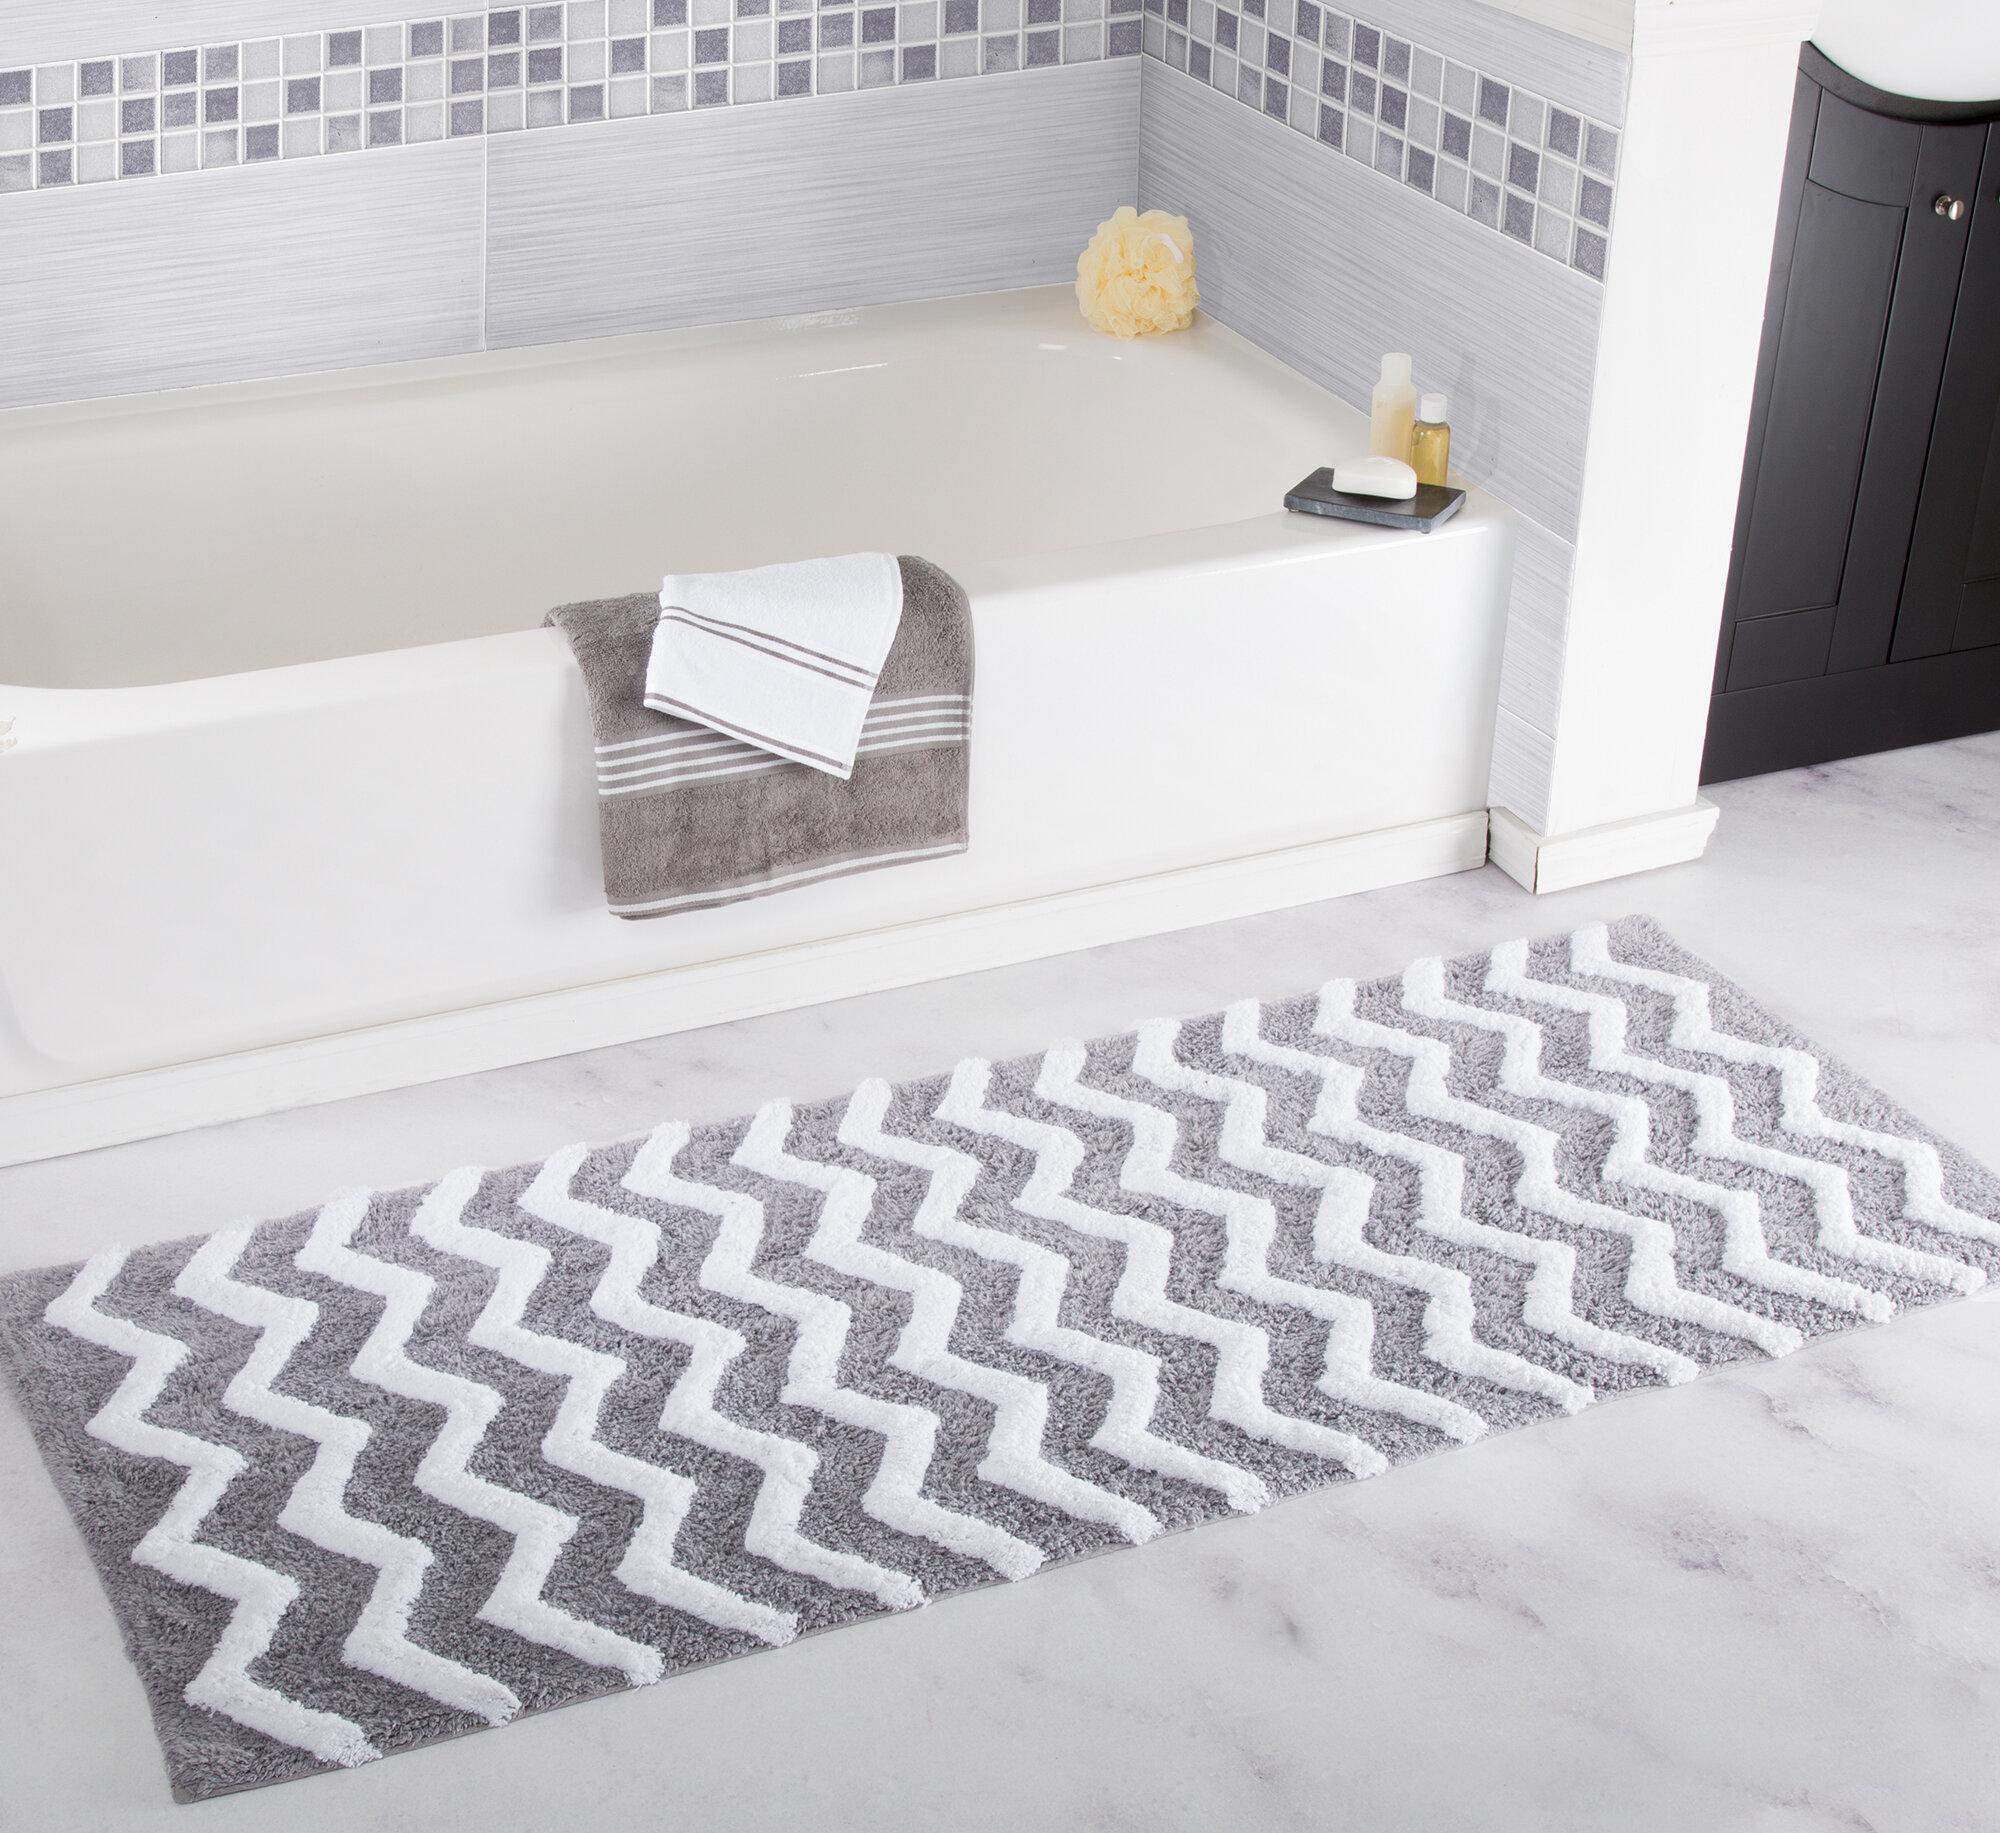 Quaanti Beach Starfish Non-Slip Bath Mat Set 3-Piece Soft Bath Rug Set Includes Bathroom Rugs//Contour Mat//Toilet Cover,Decorative Floor Mat Indoor//Front Door//Bathroom Rug Beach Seascape G